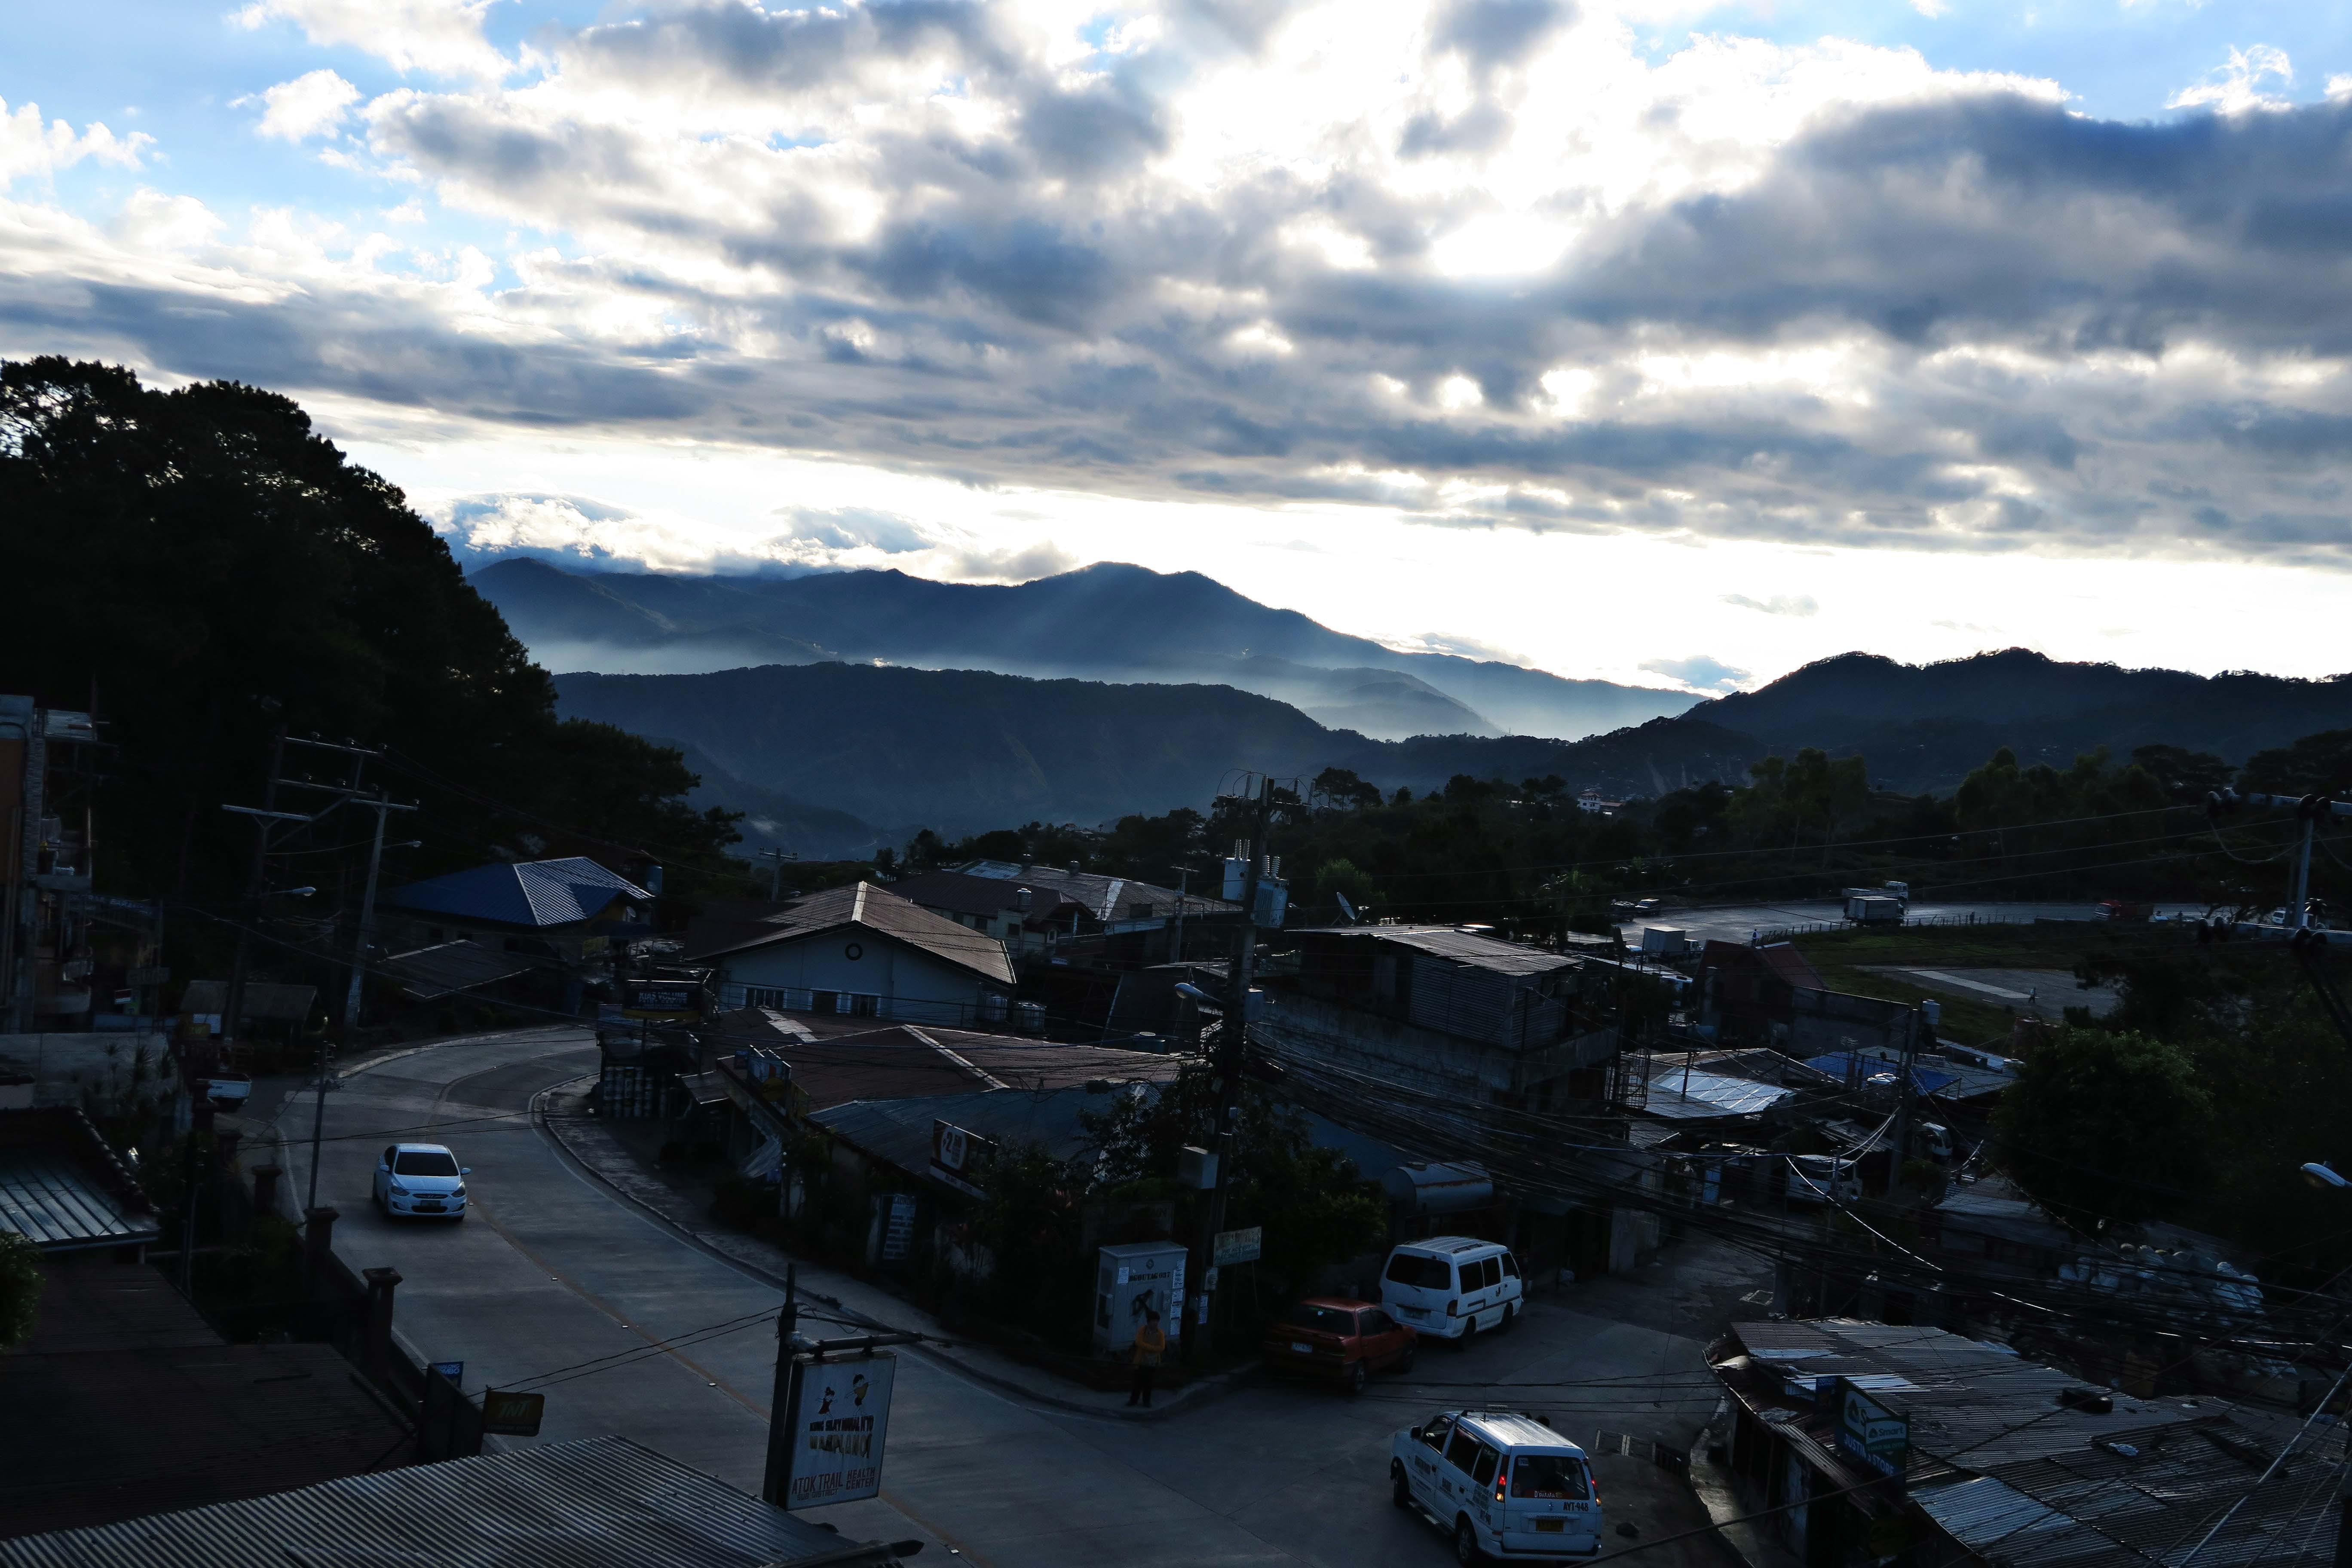 Free stock photo of Baguio, Philippines